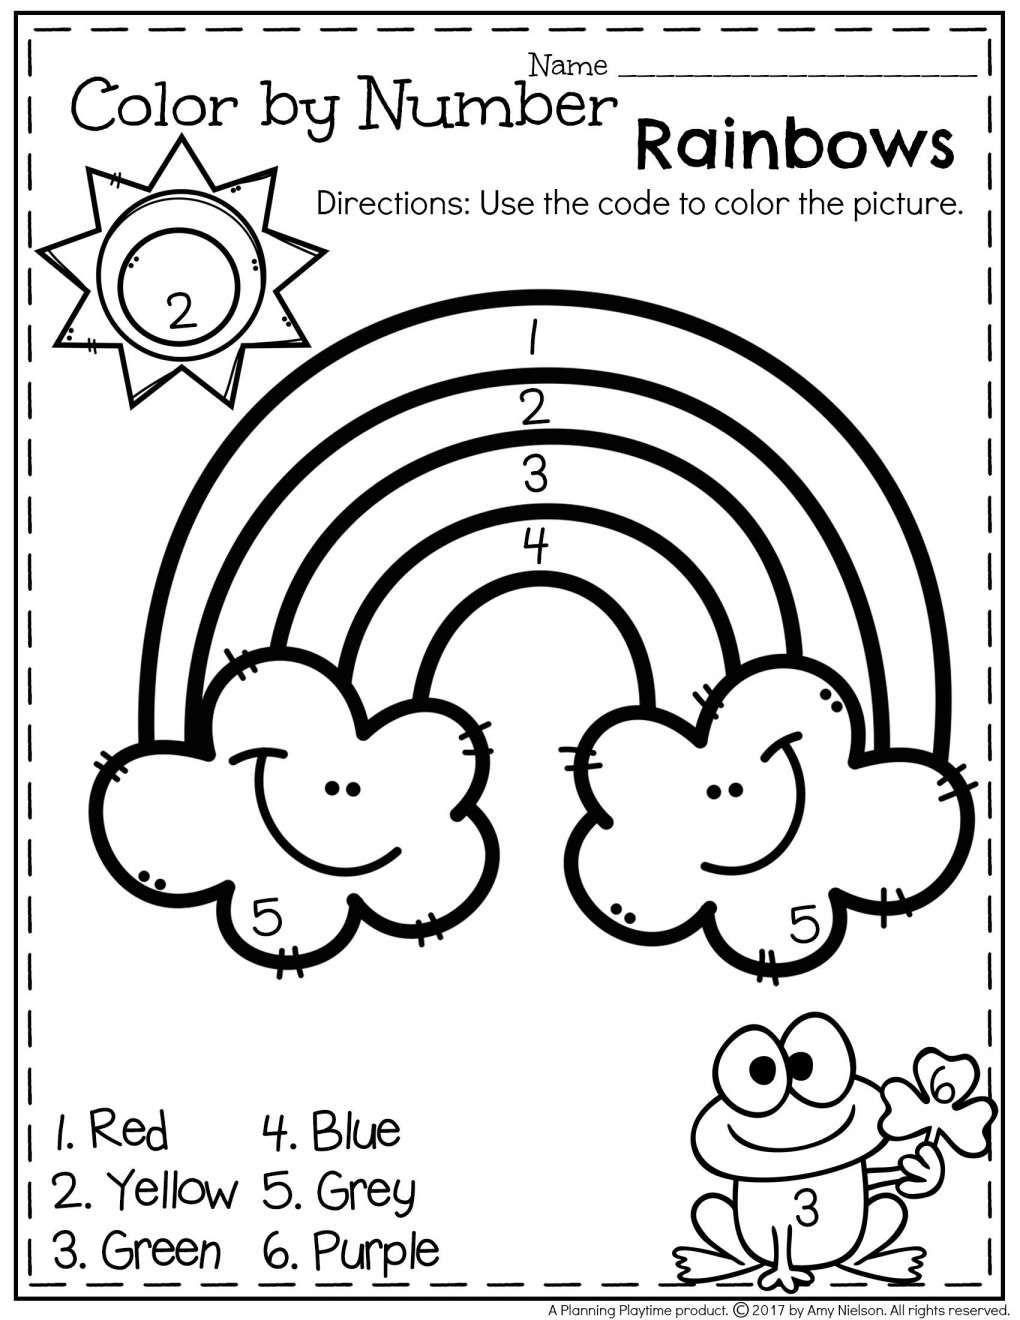 17 Pinterest Weather Worksheet For Kindergarten Chart Sheet Com March Preschool Worksheets Free Preschool Worksheets Color Worksheets For Preschool